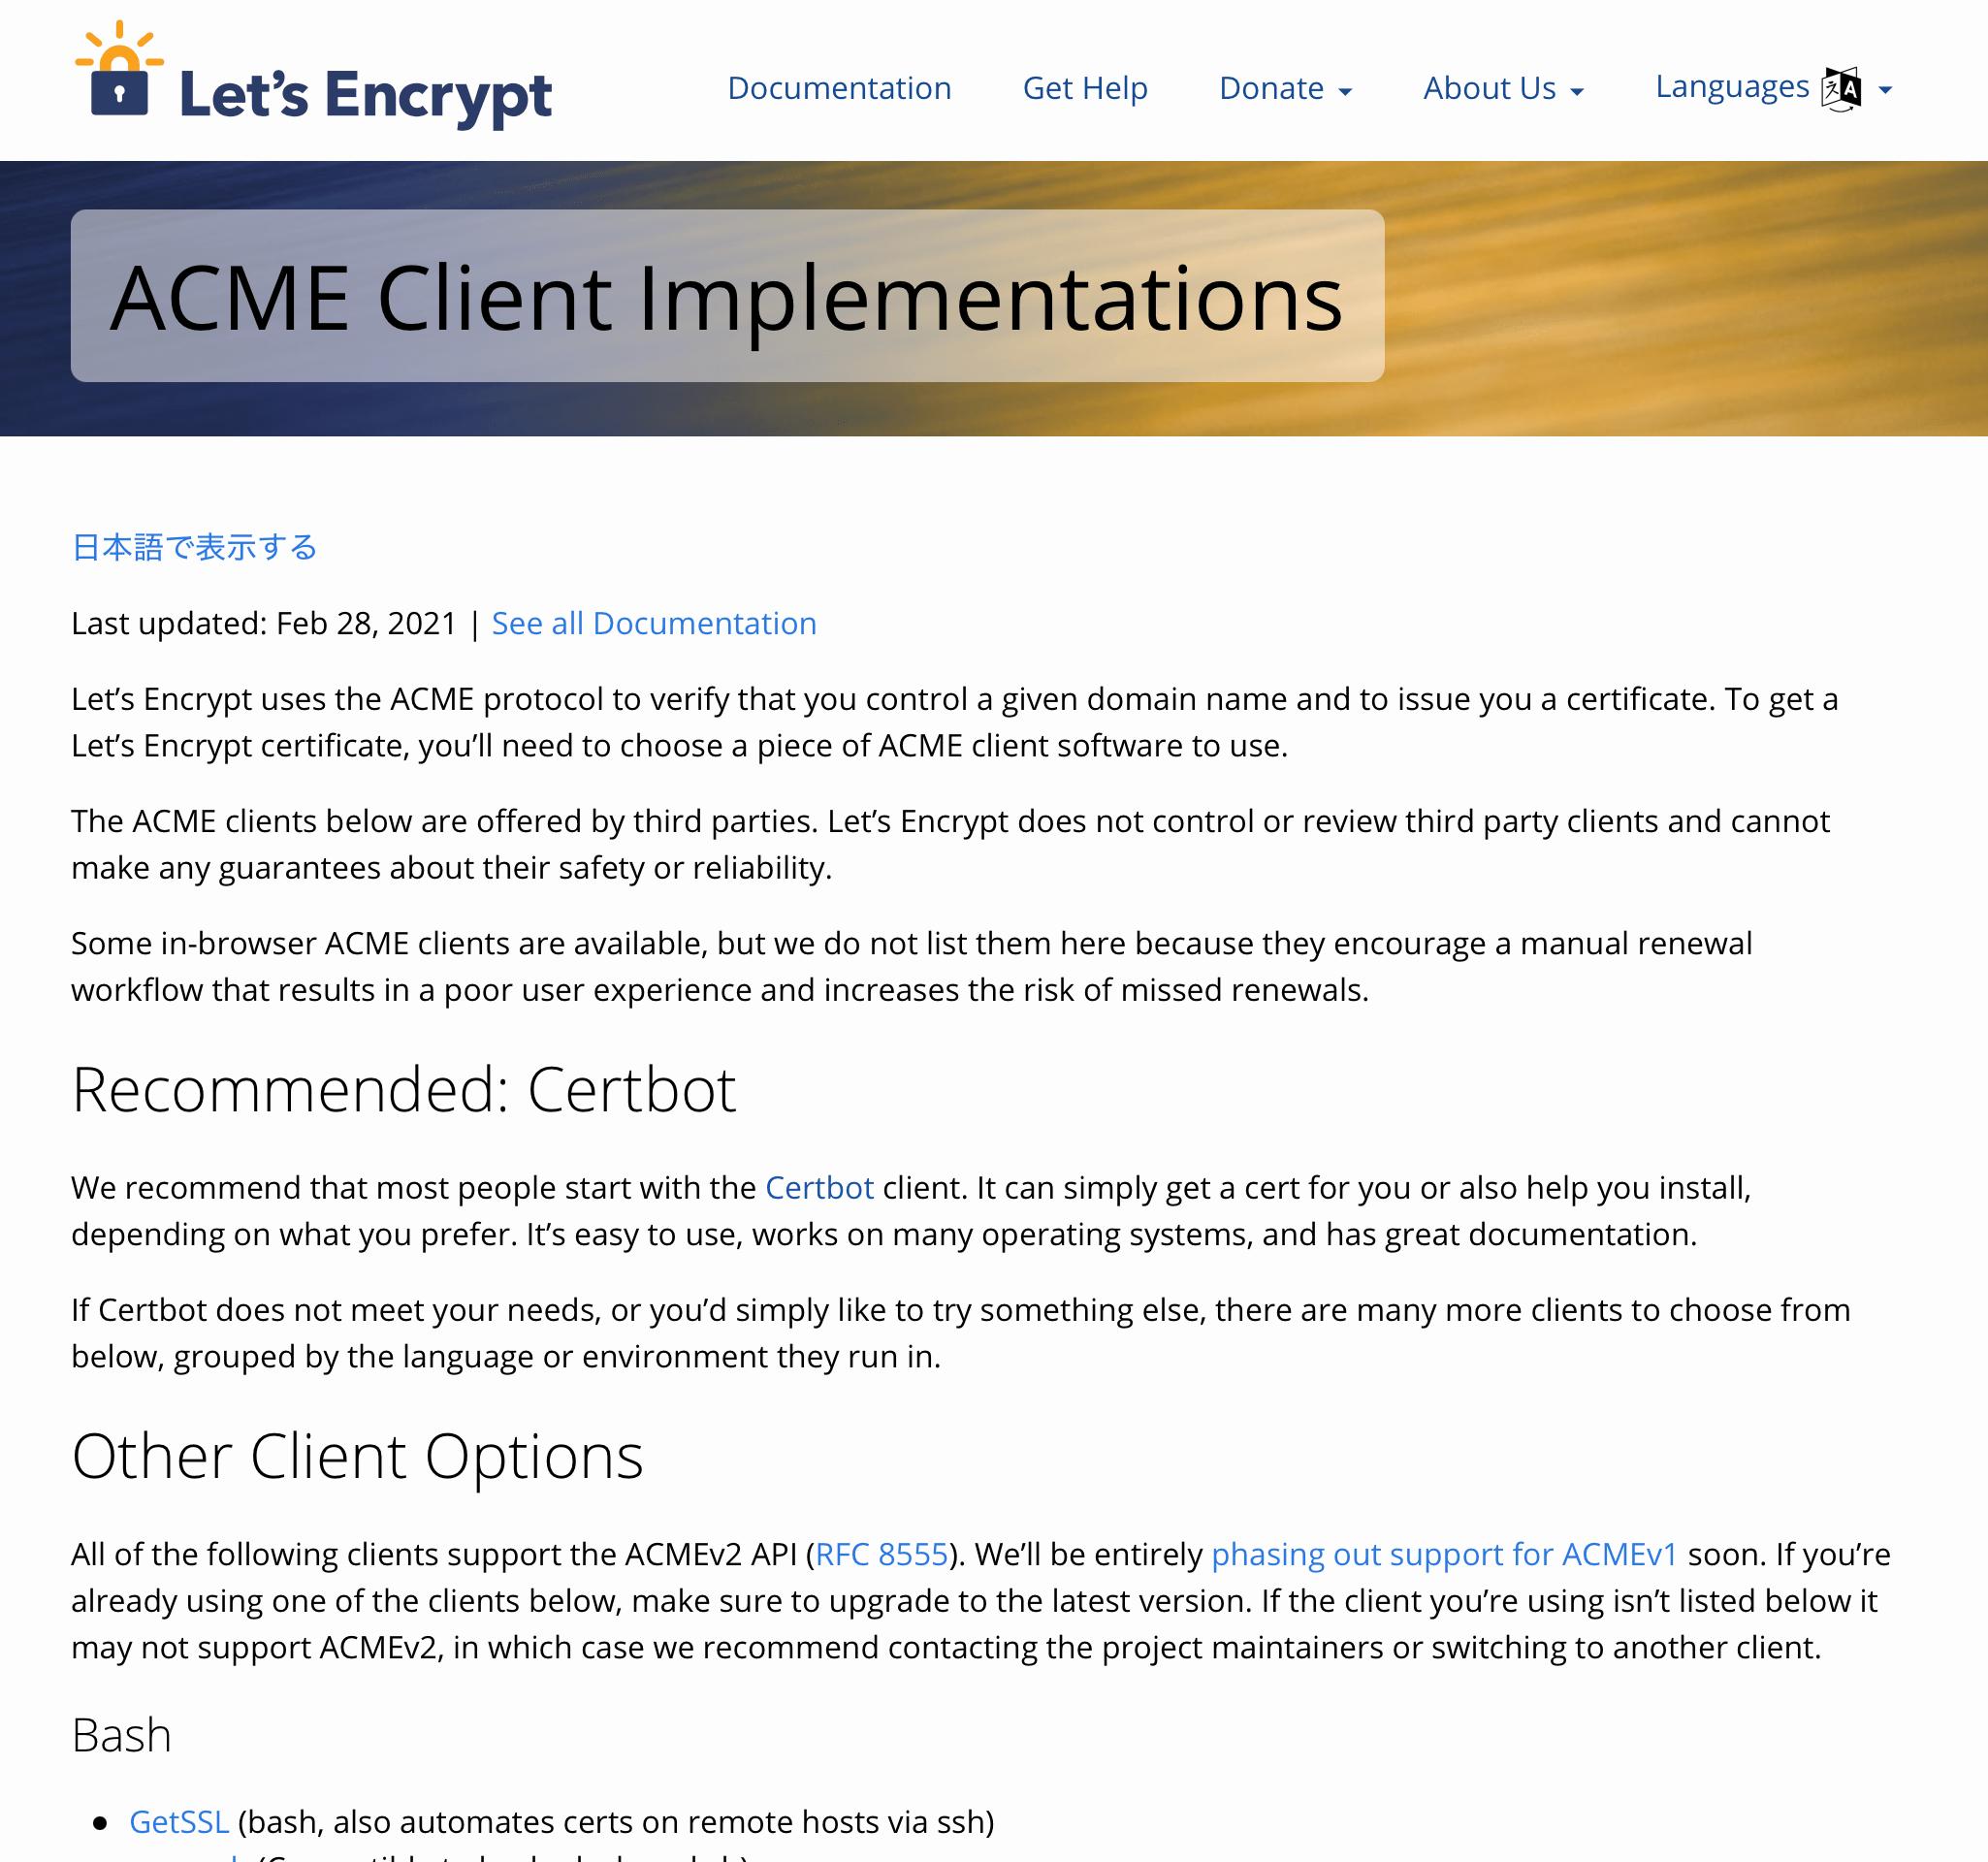 lets encrypt ACMEv1 to ACMEv2